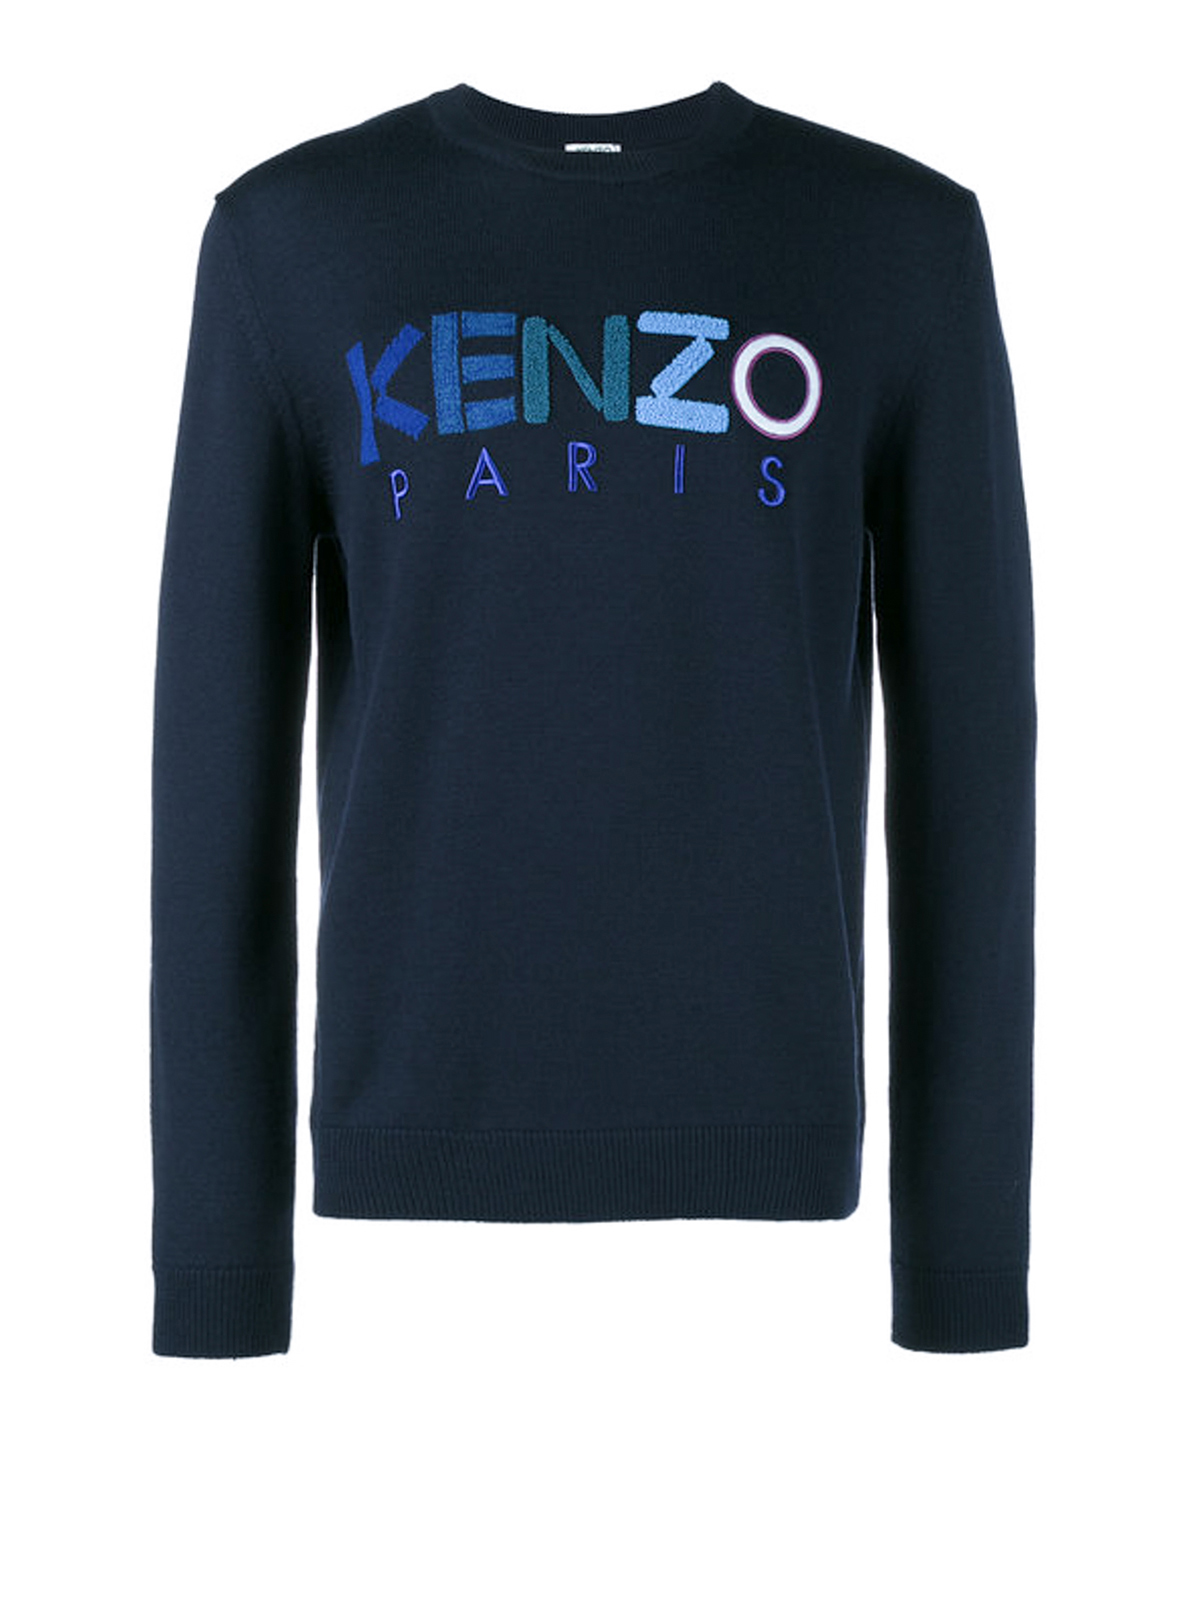 F765pu2313ld76 Sweatshirt Kenzo Pullover Blau Sweatshirts Und FA7wHaxqT